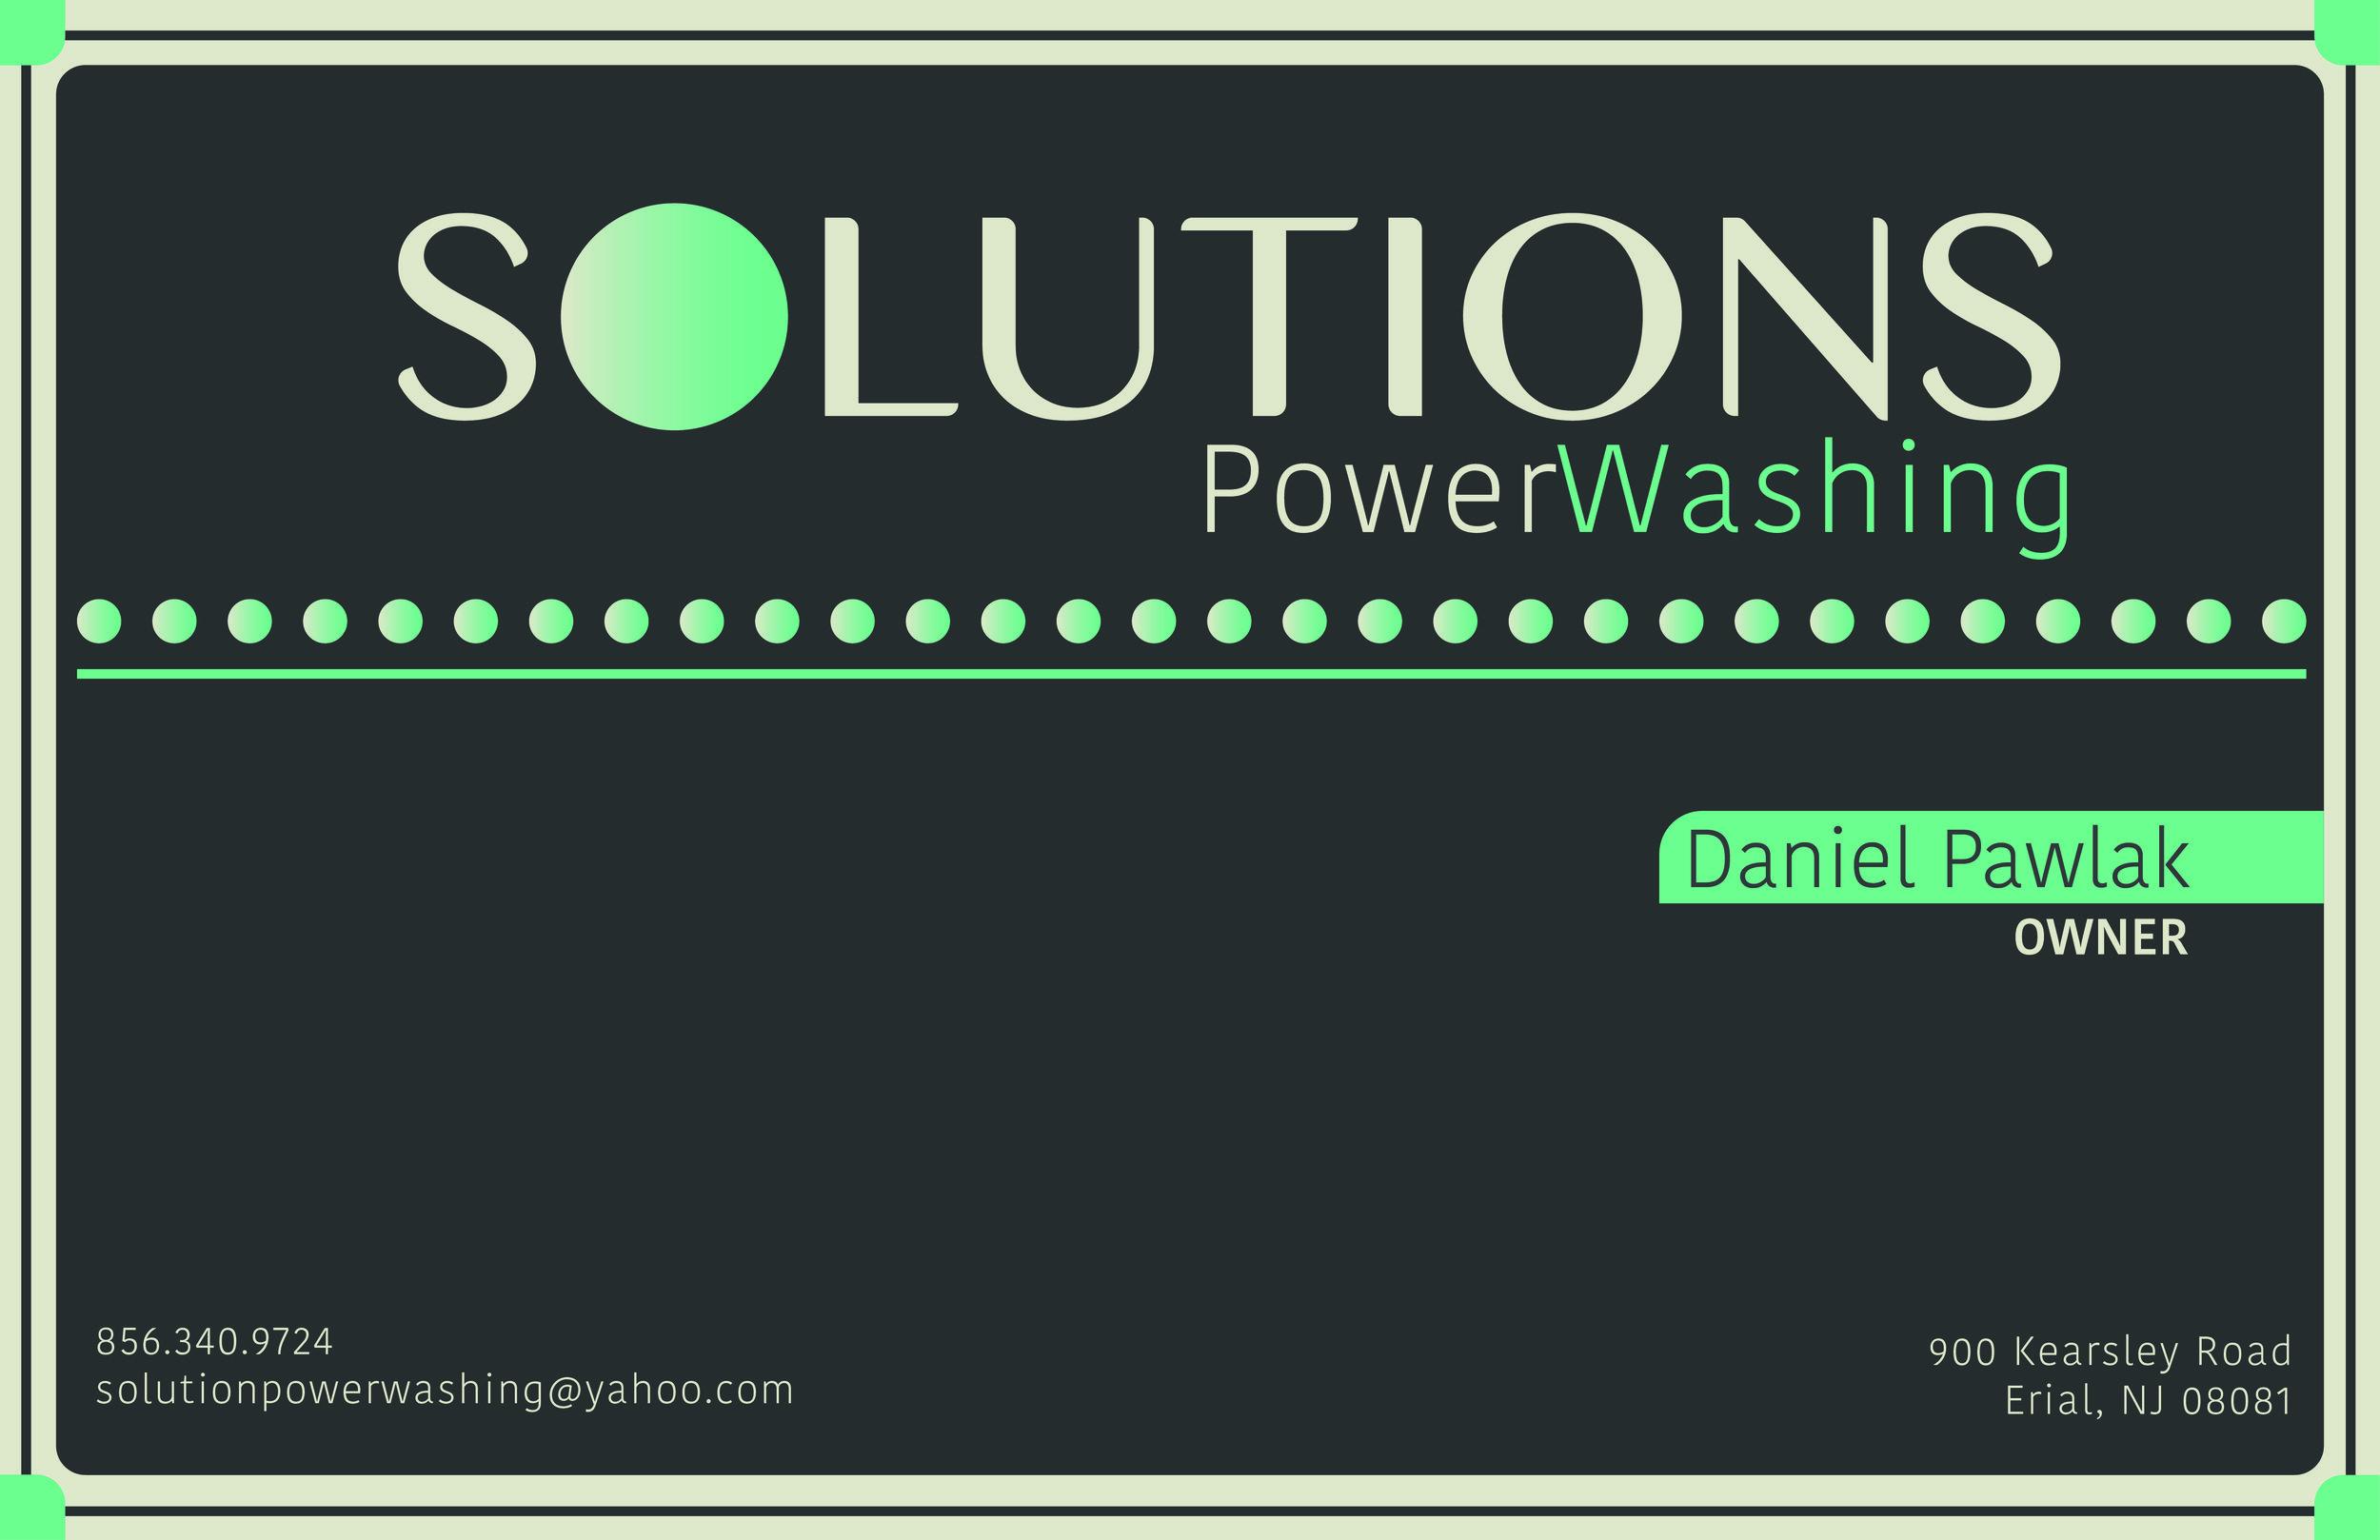 SOLUTIONS POWERWASHING03.jpg